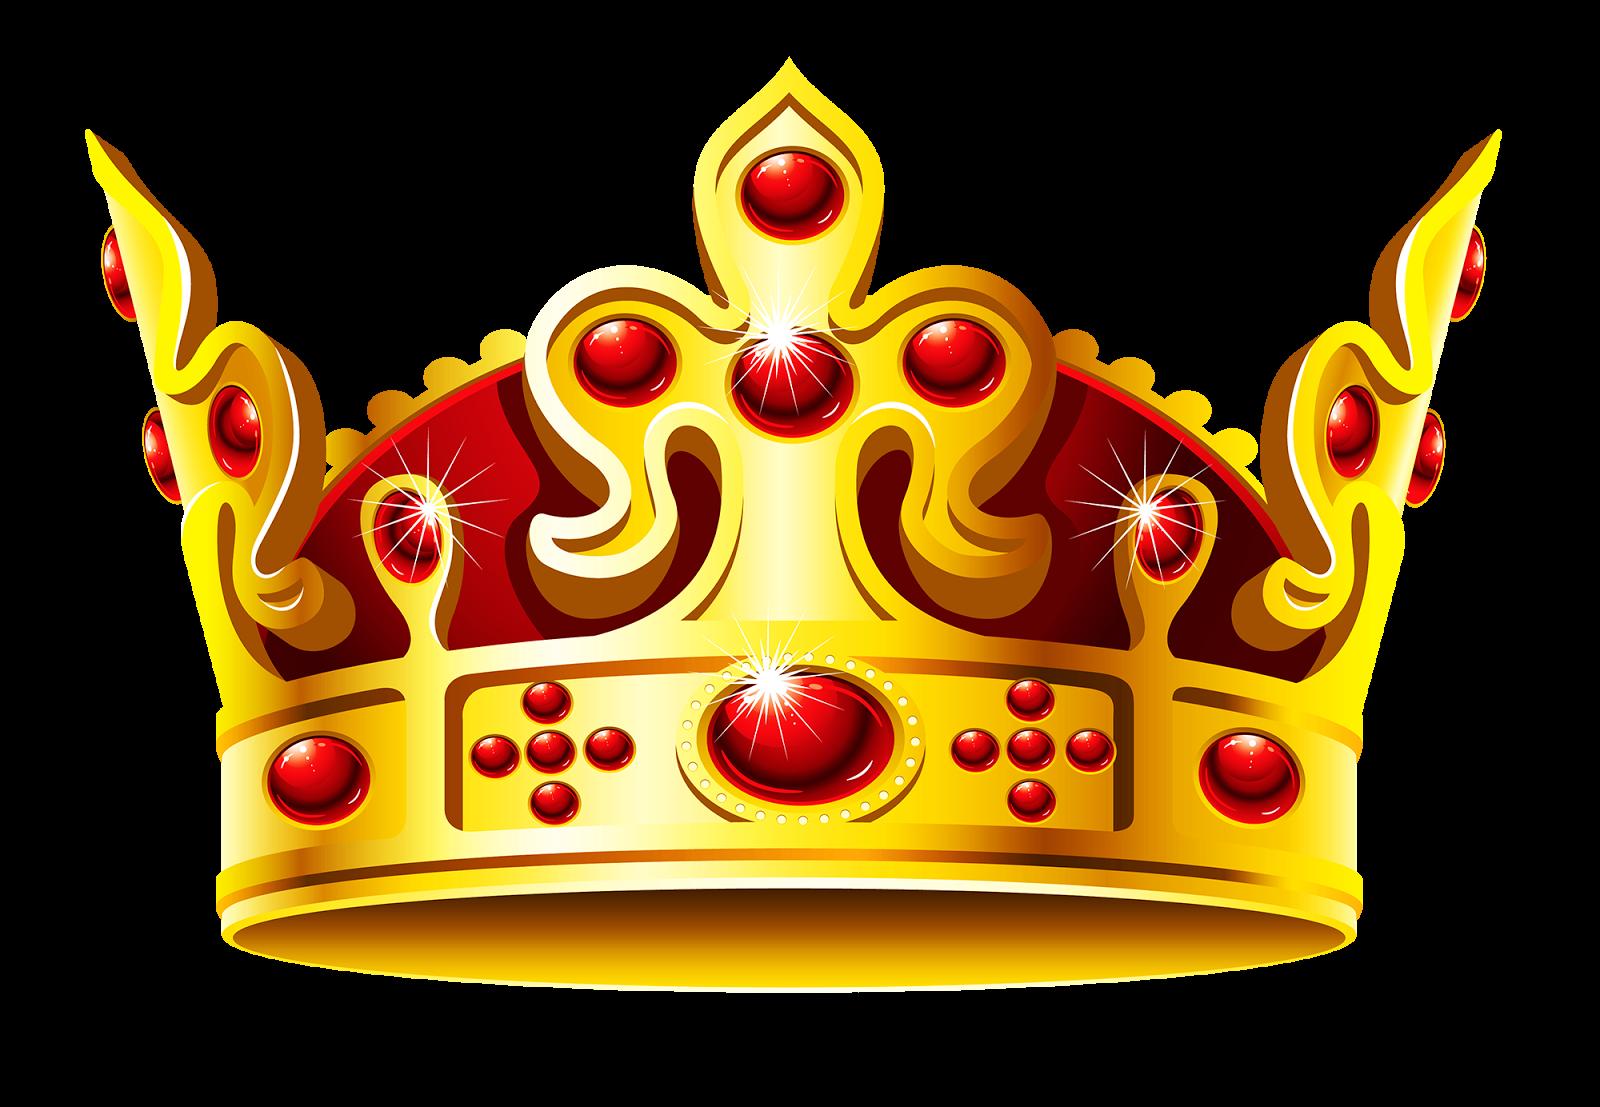 King clipart mean. Artes ideias moldes personalizados